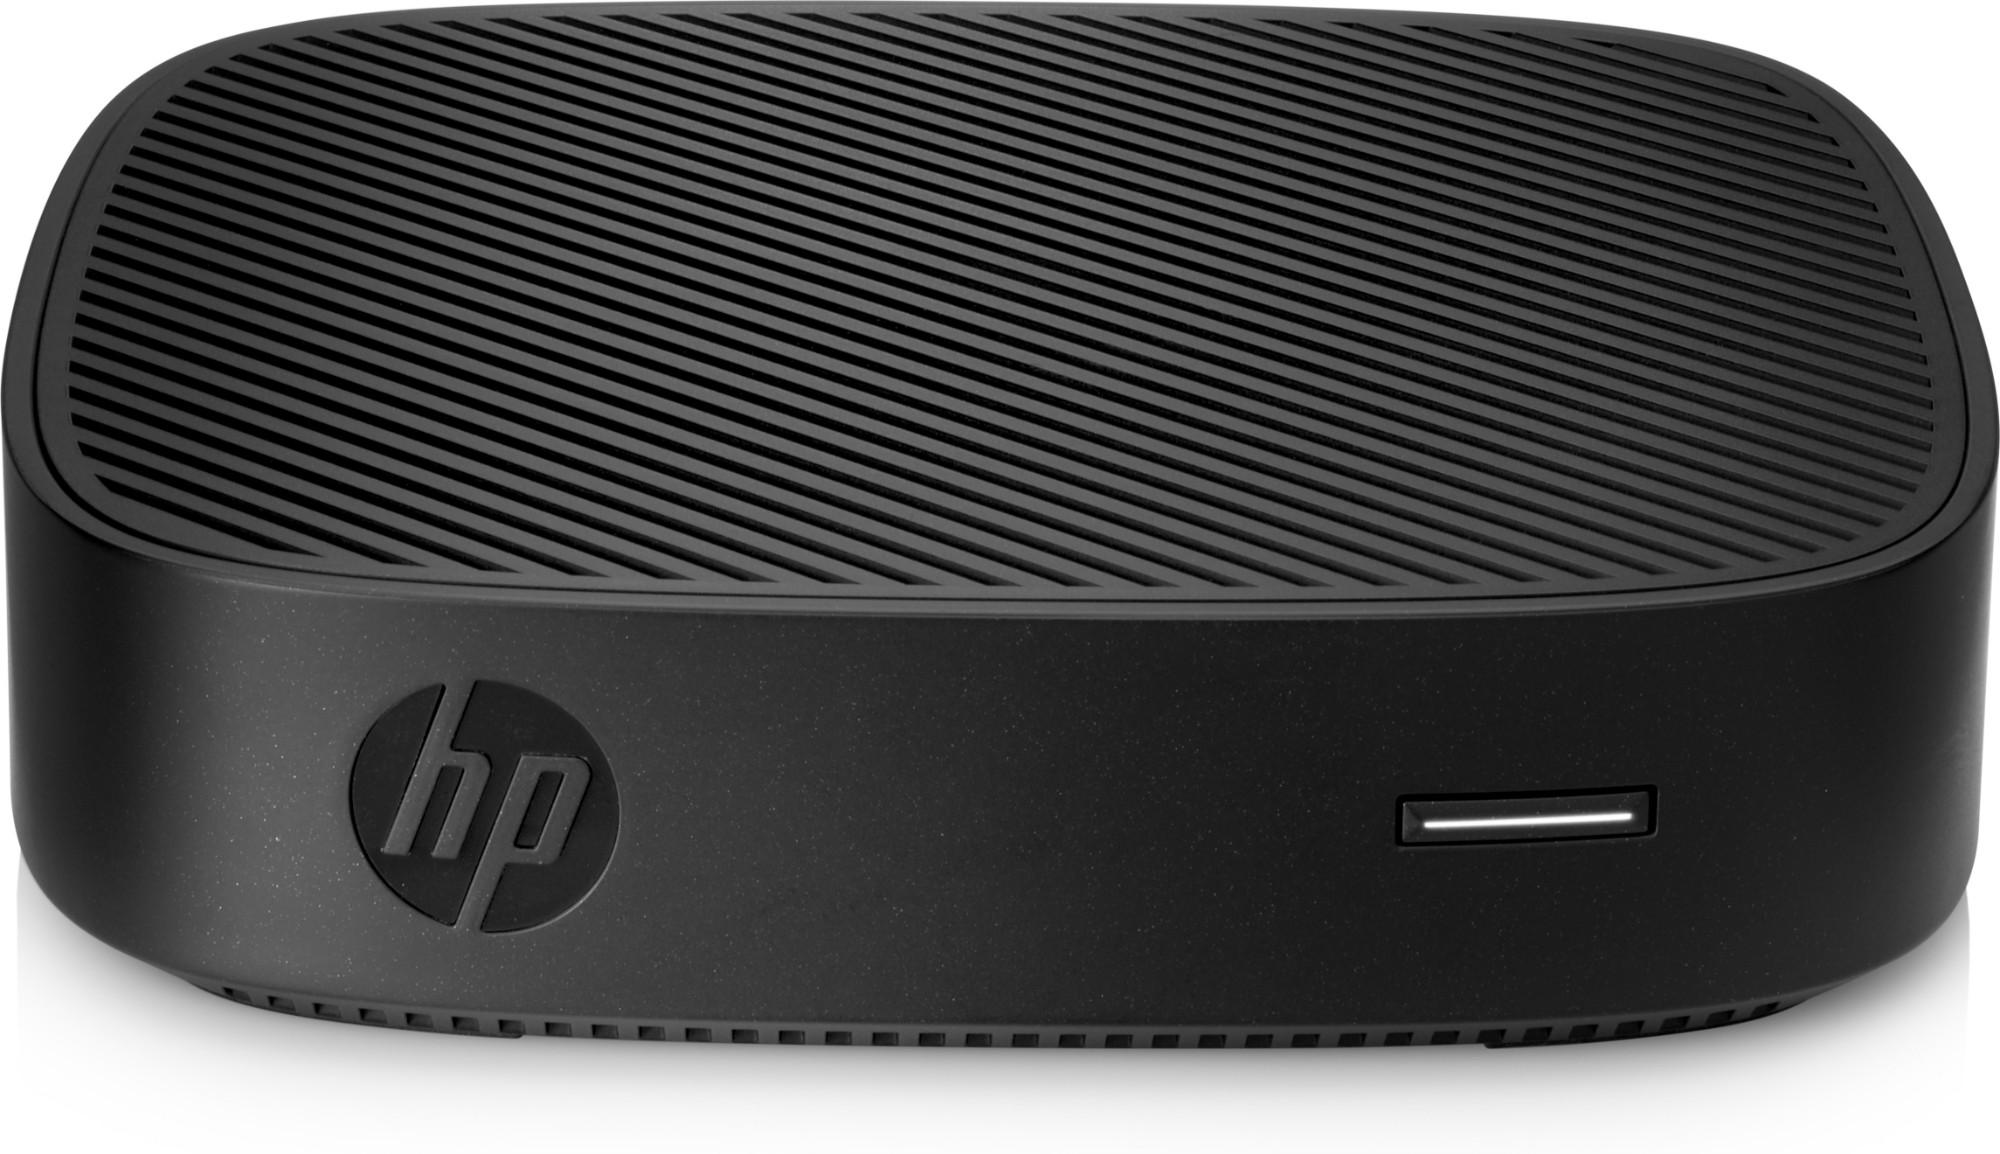 HP t430 1,1 GHz N4000 Negro ThinPro 740 g